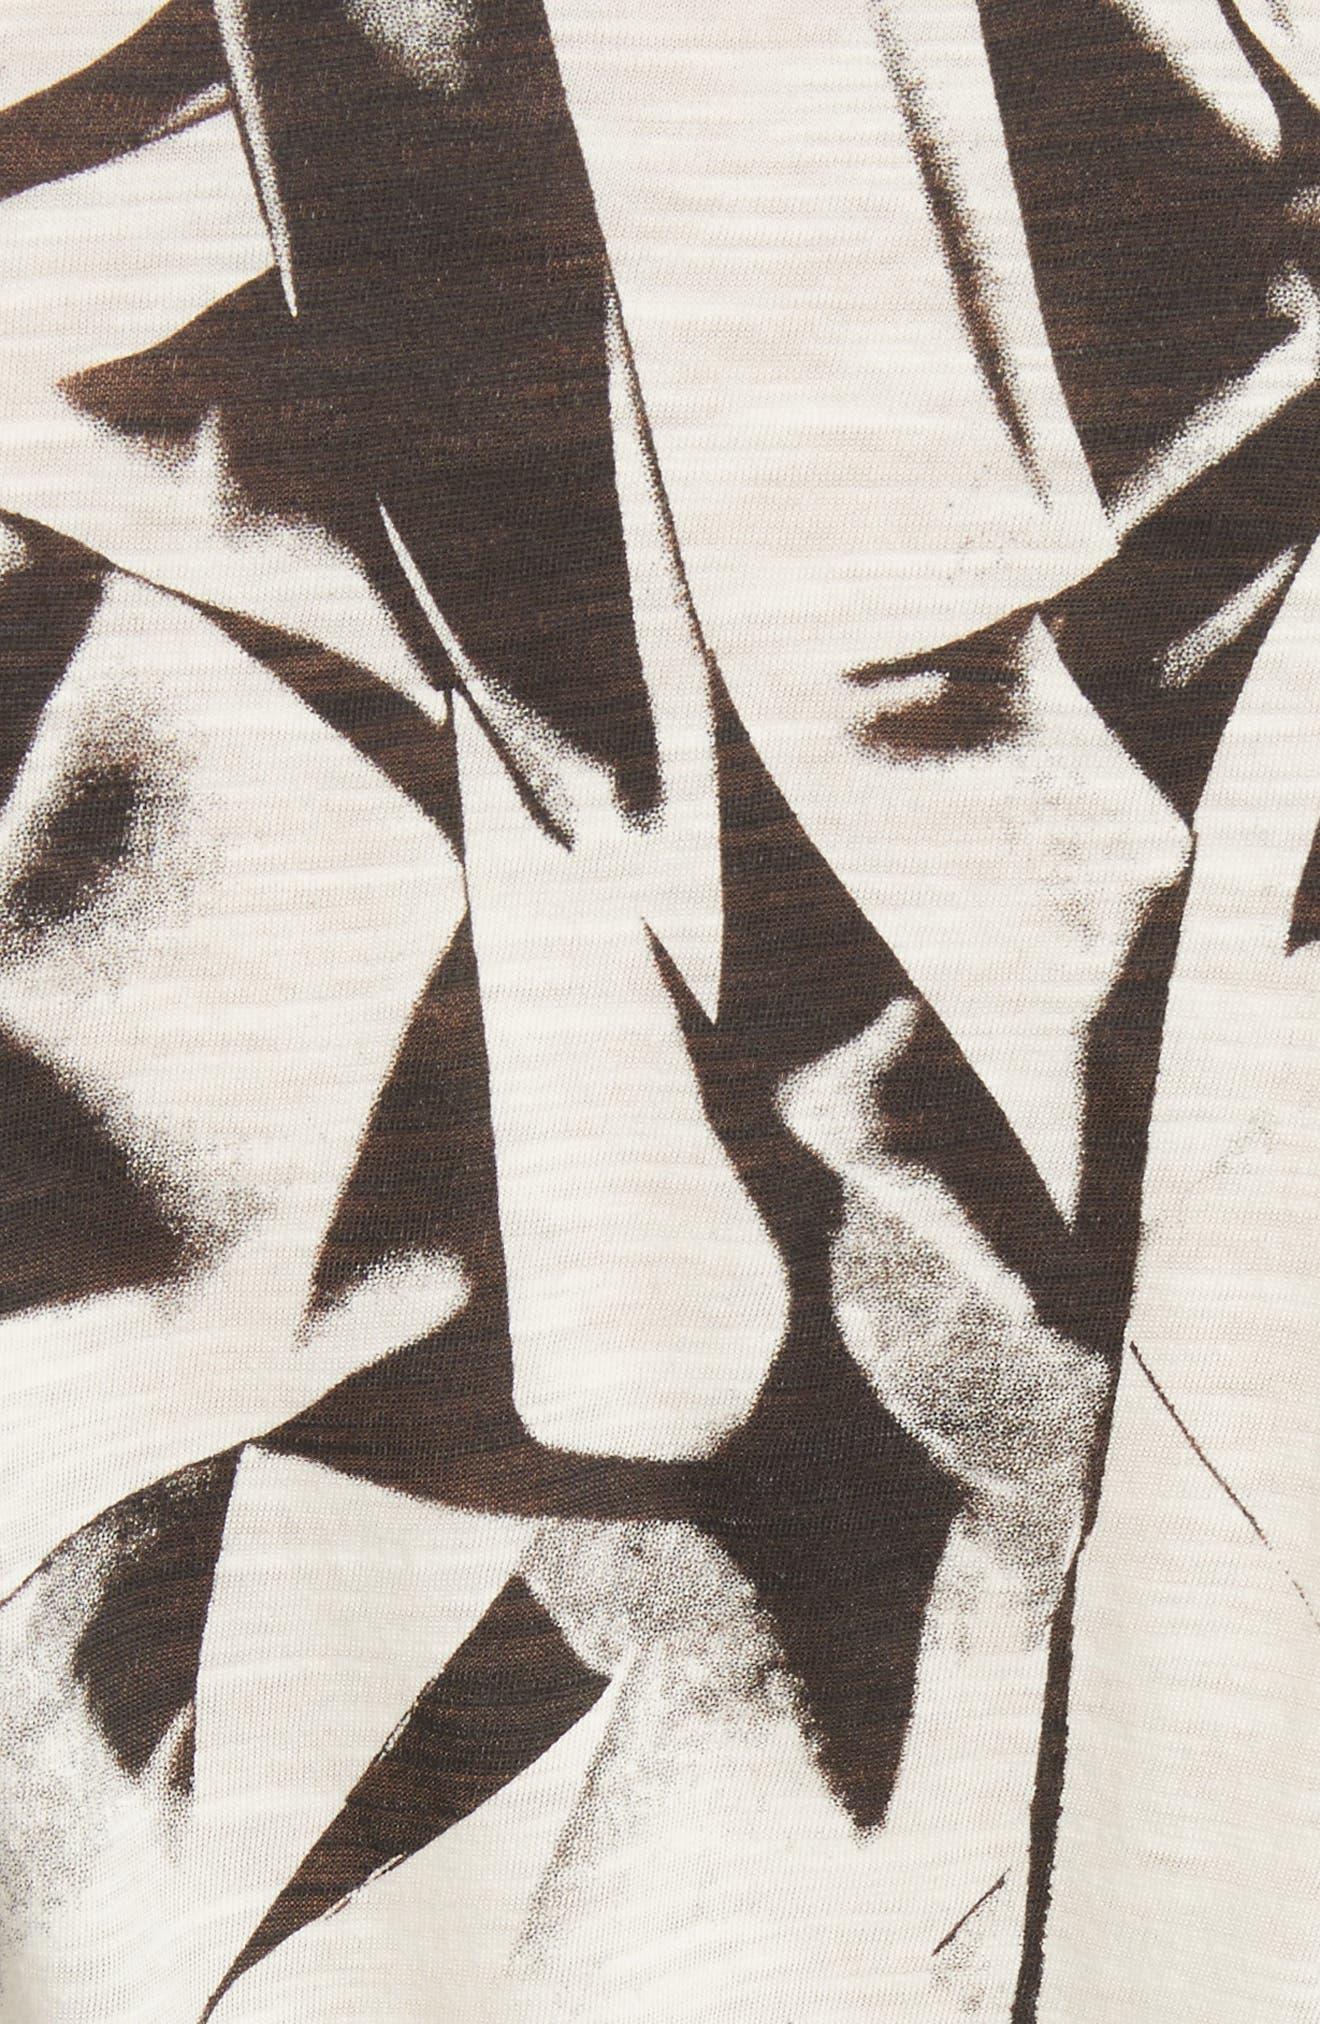 Band Detail Print Tissue Jersey Tee,                             Alternate thumbnail 5, color,                             Ecru/ Black Crushed Print